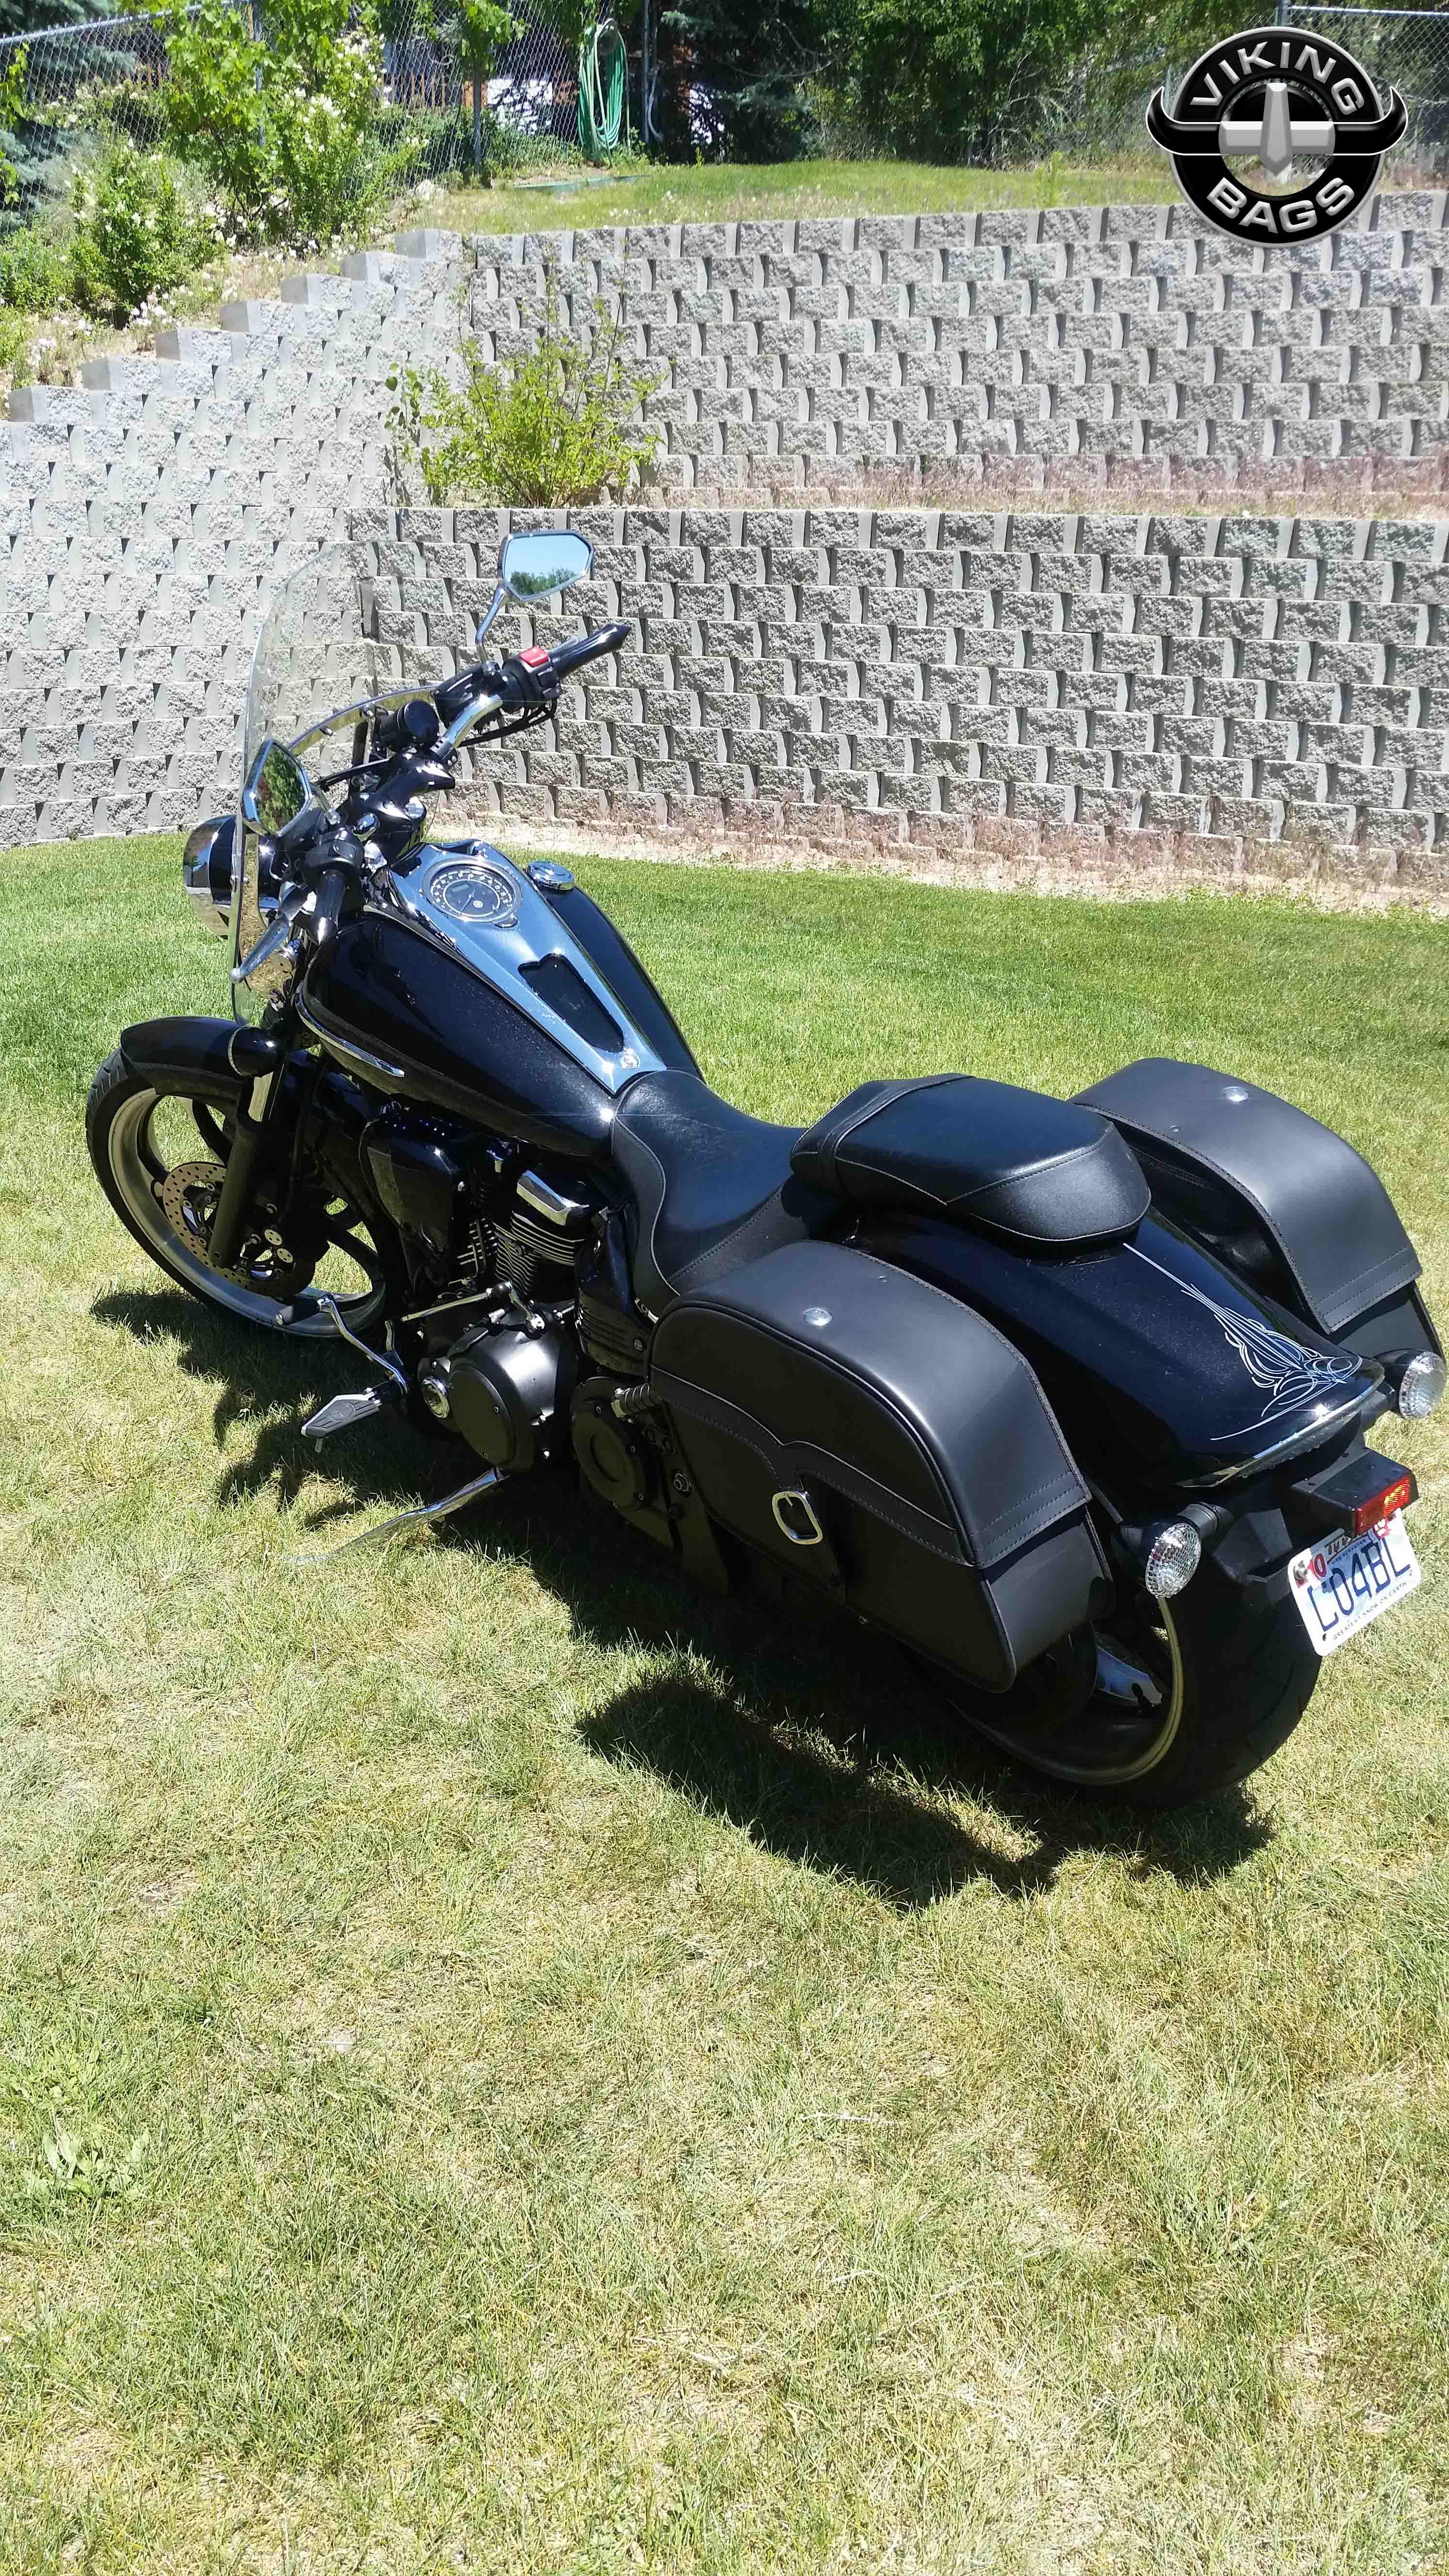 Yamaha raider motorcycle saddlebags l charger single strap for Yamaha raider hard saddlebags